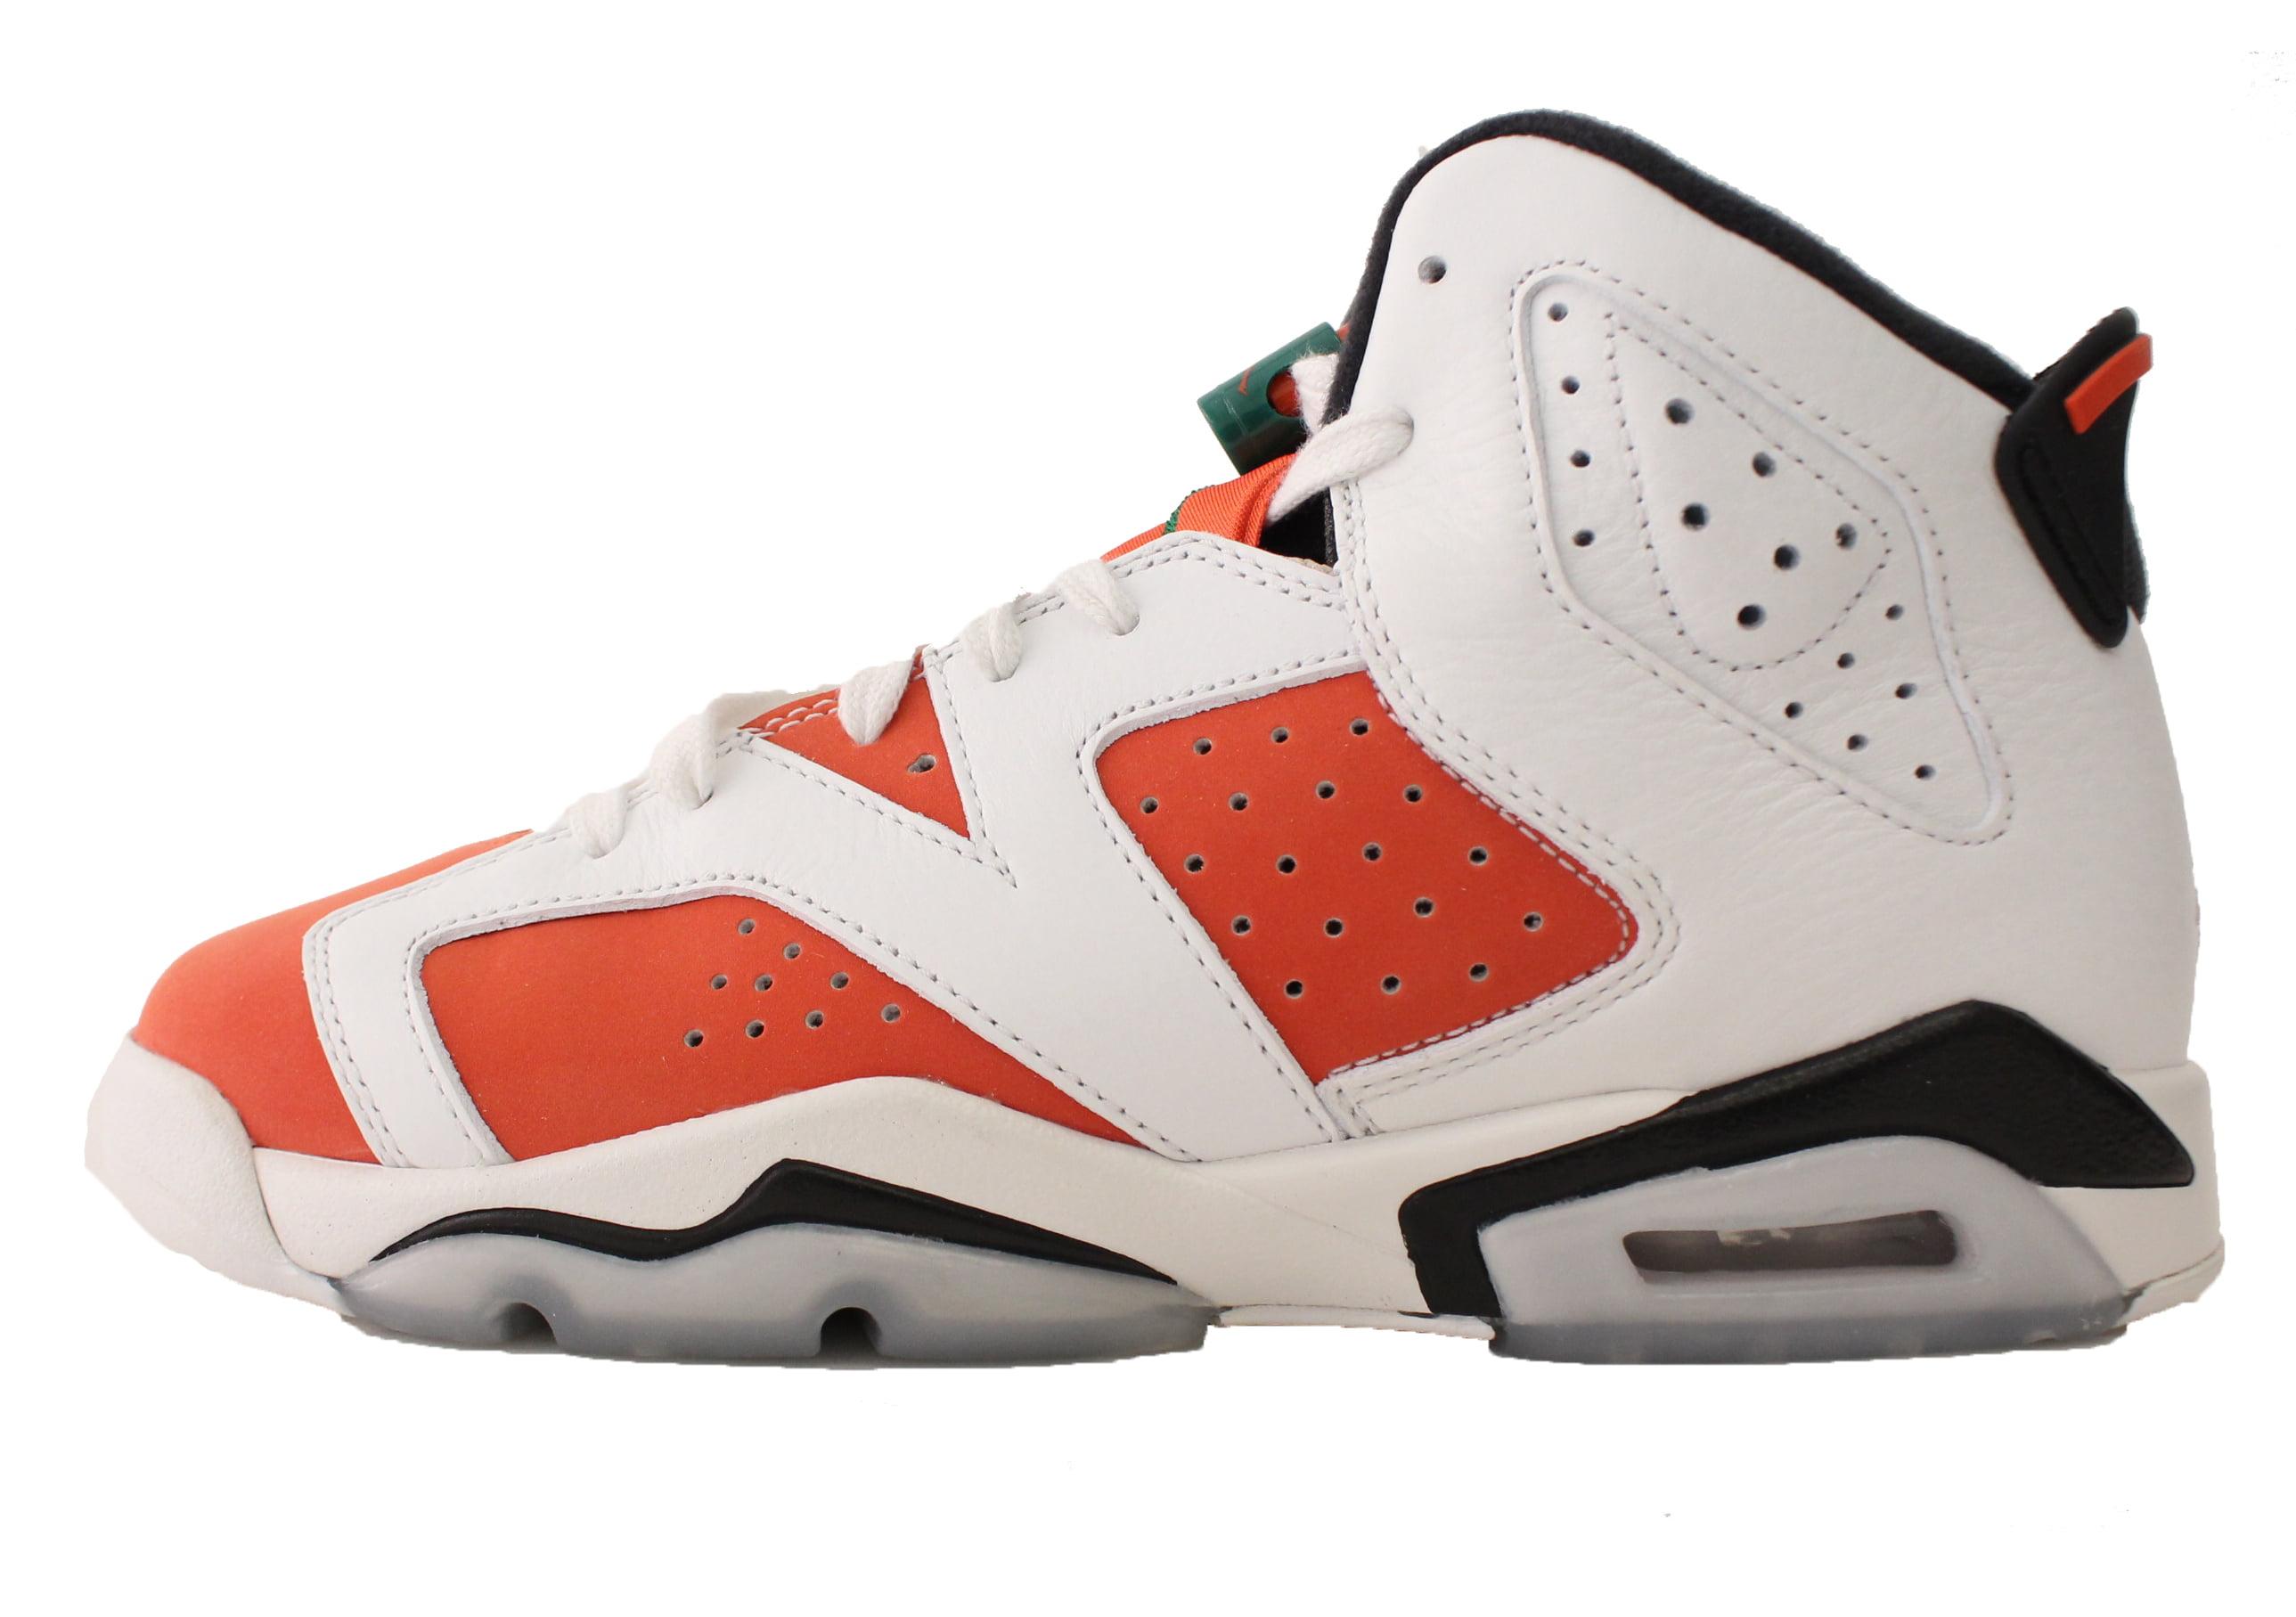 Kids Air Jordan Retro 6 VI GS Like Mike Gatorade Summit White Black Te -  Walmart.com